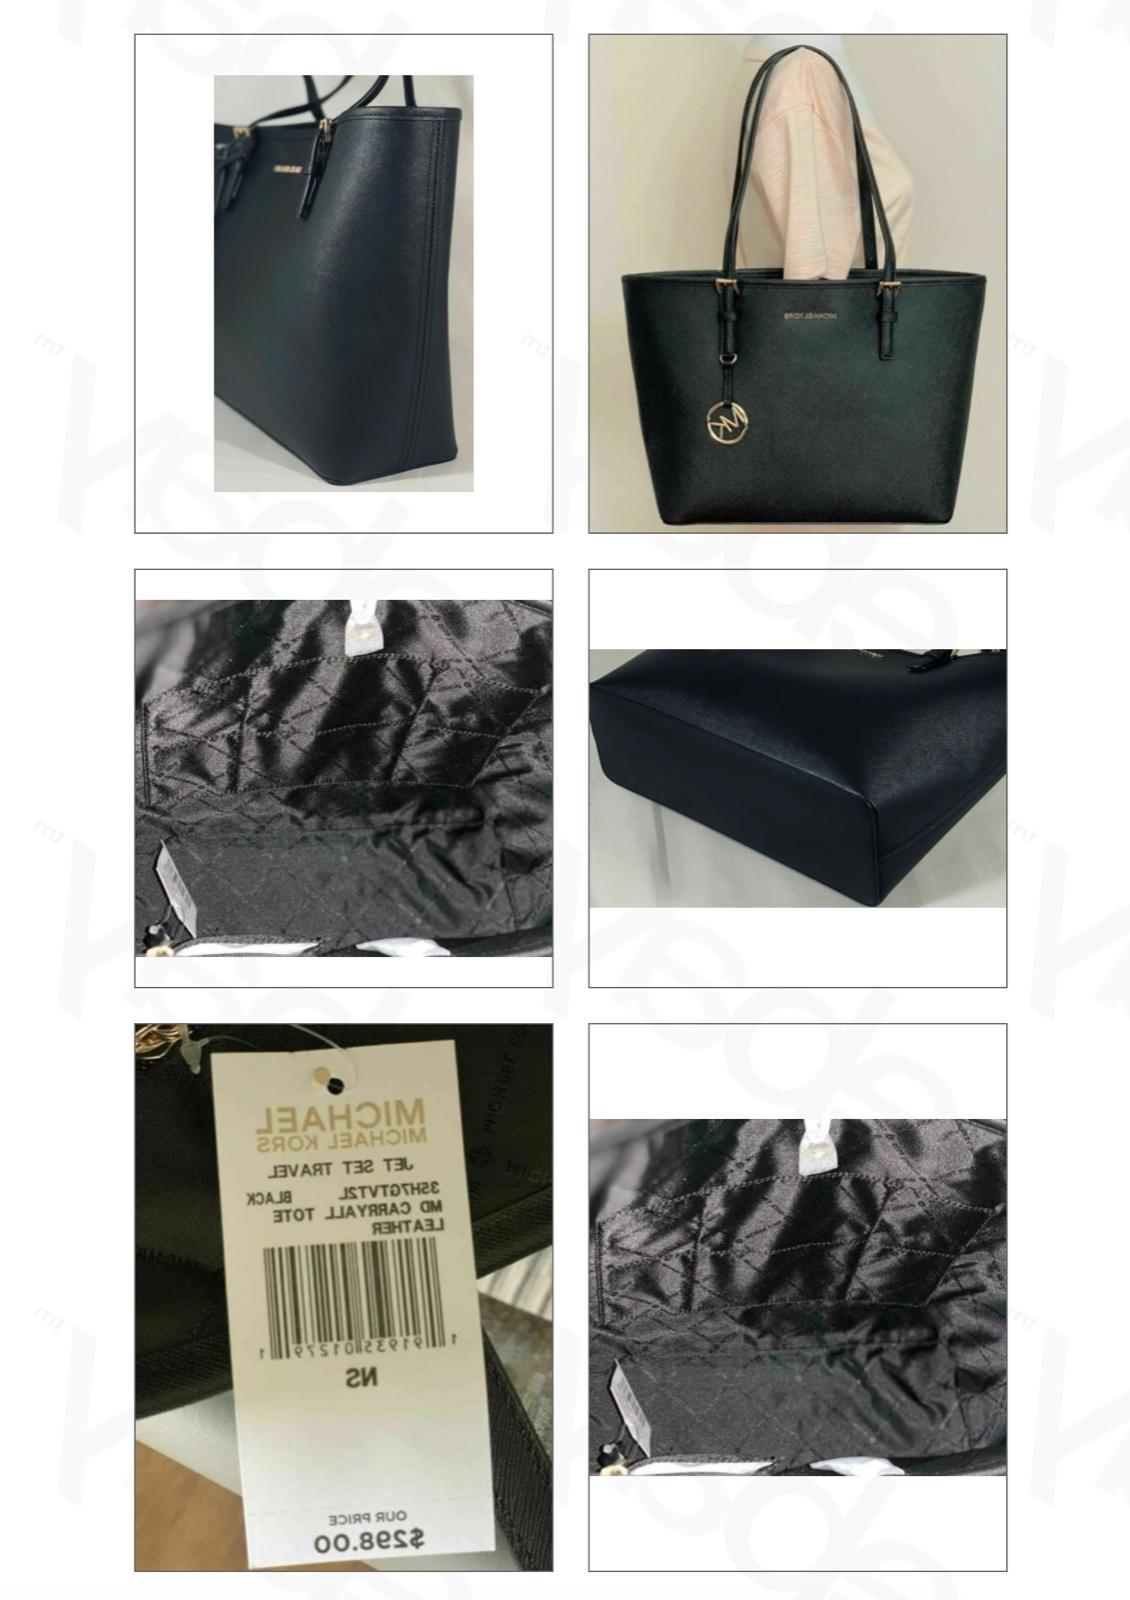 Travel Saffiano Carryall Tote Bag Black